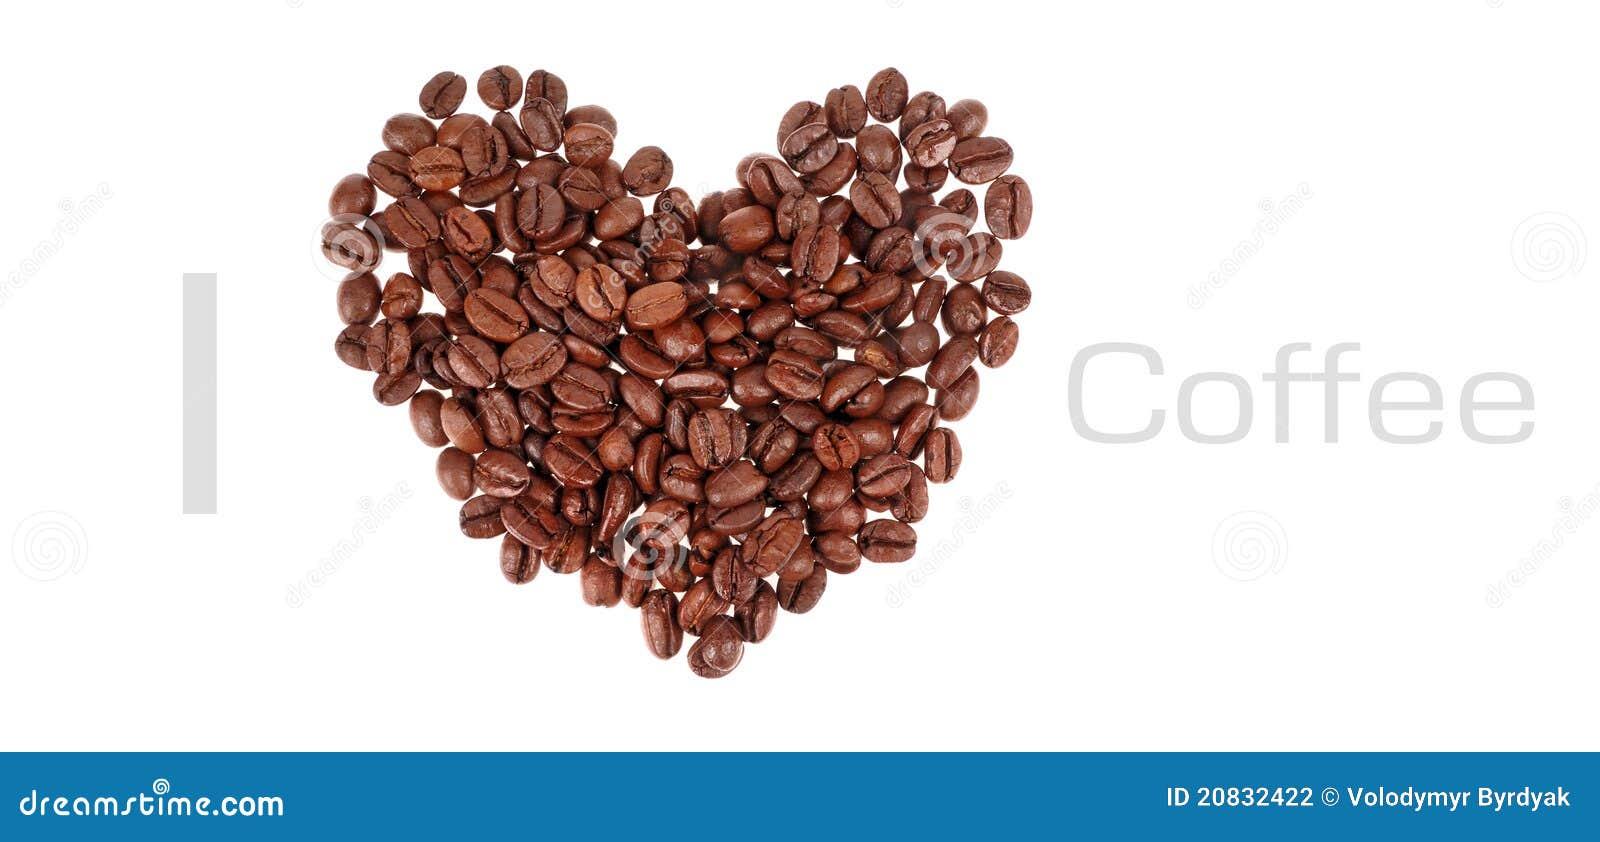 coffee grain stock photography image 20832422. Black Bedroom Furniture Sets. Home Design Ideas